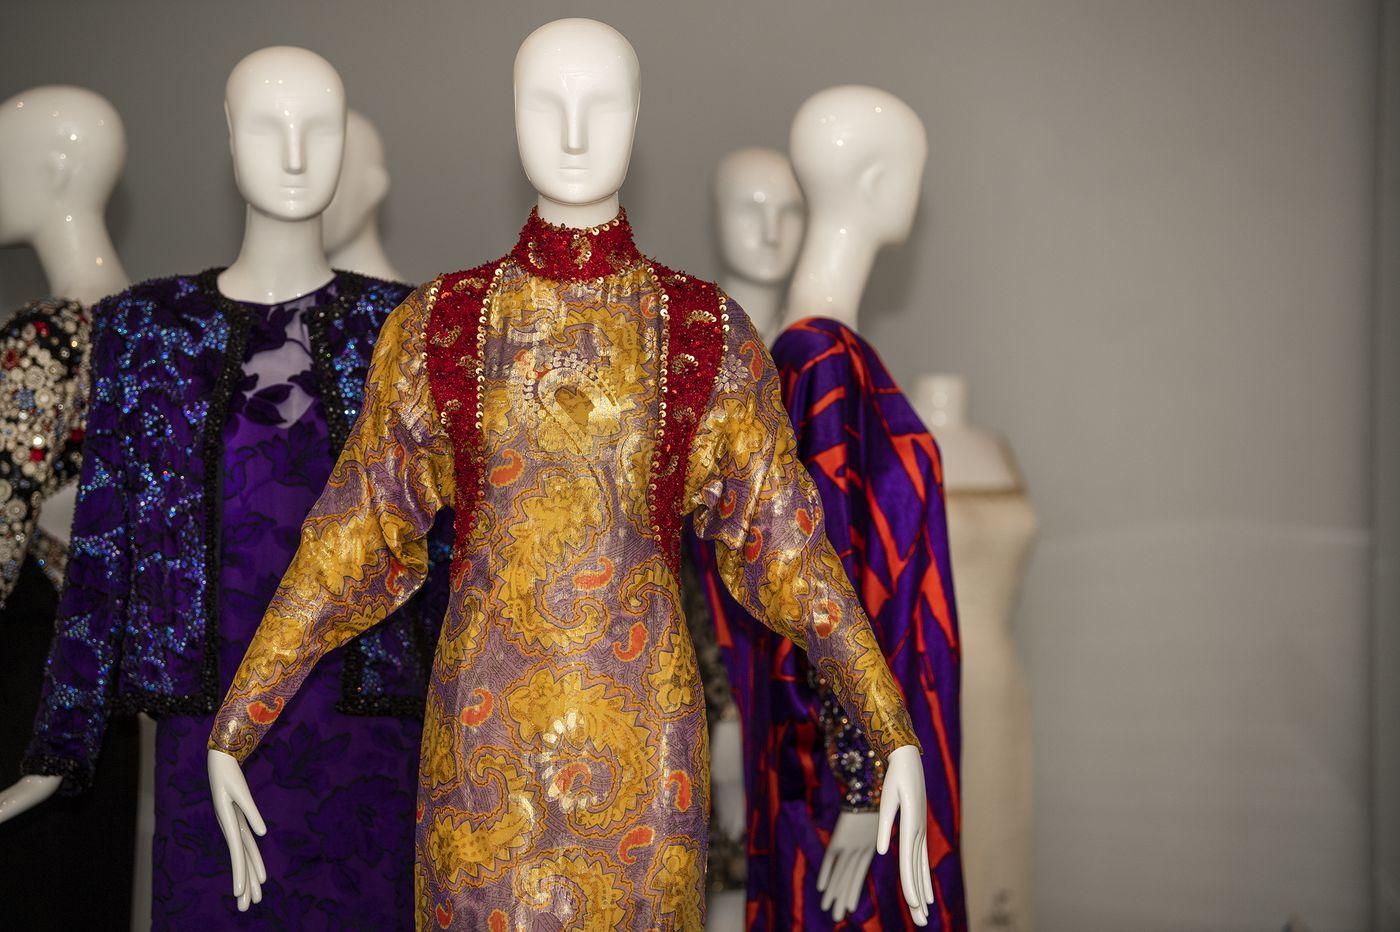 Drexel University fashion exhibit celebrates the life of Philadelphia's James Galanos | Elizabeth Wellington